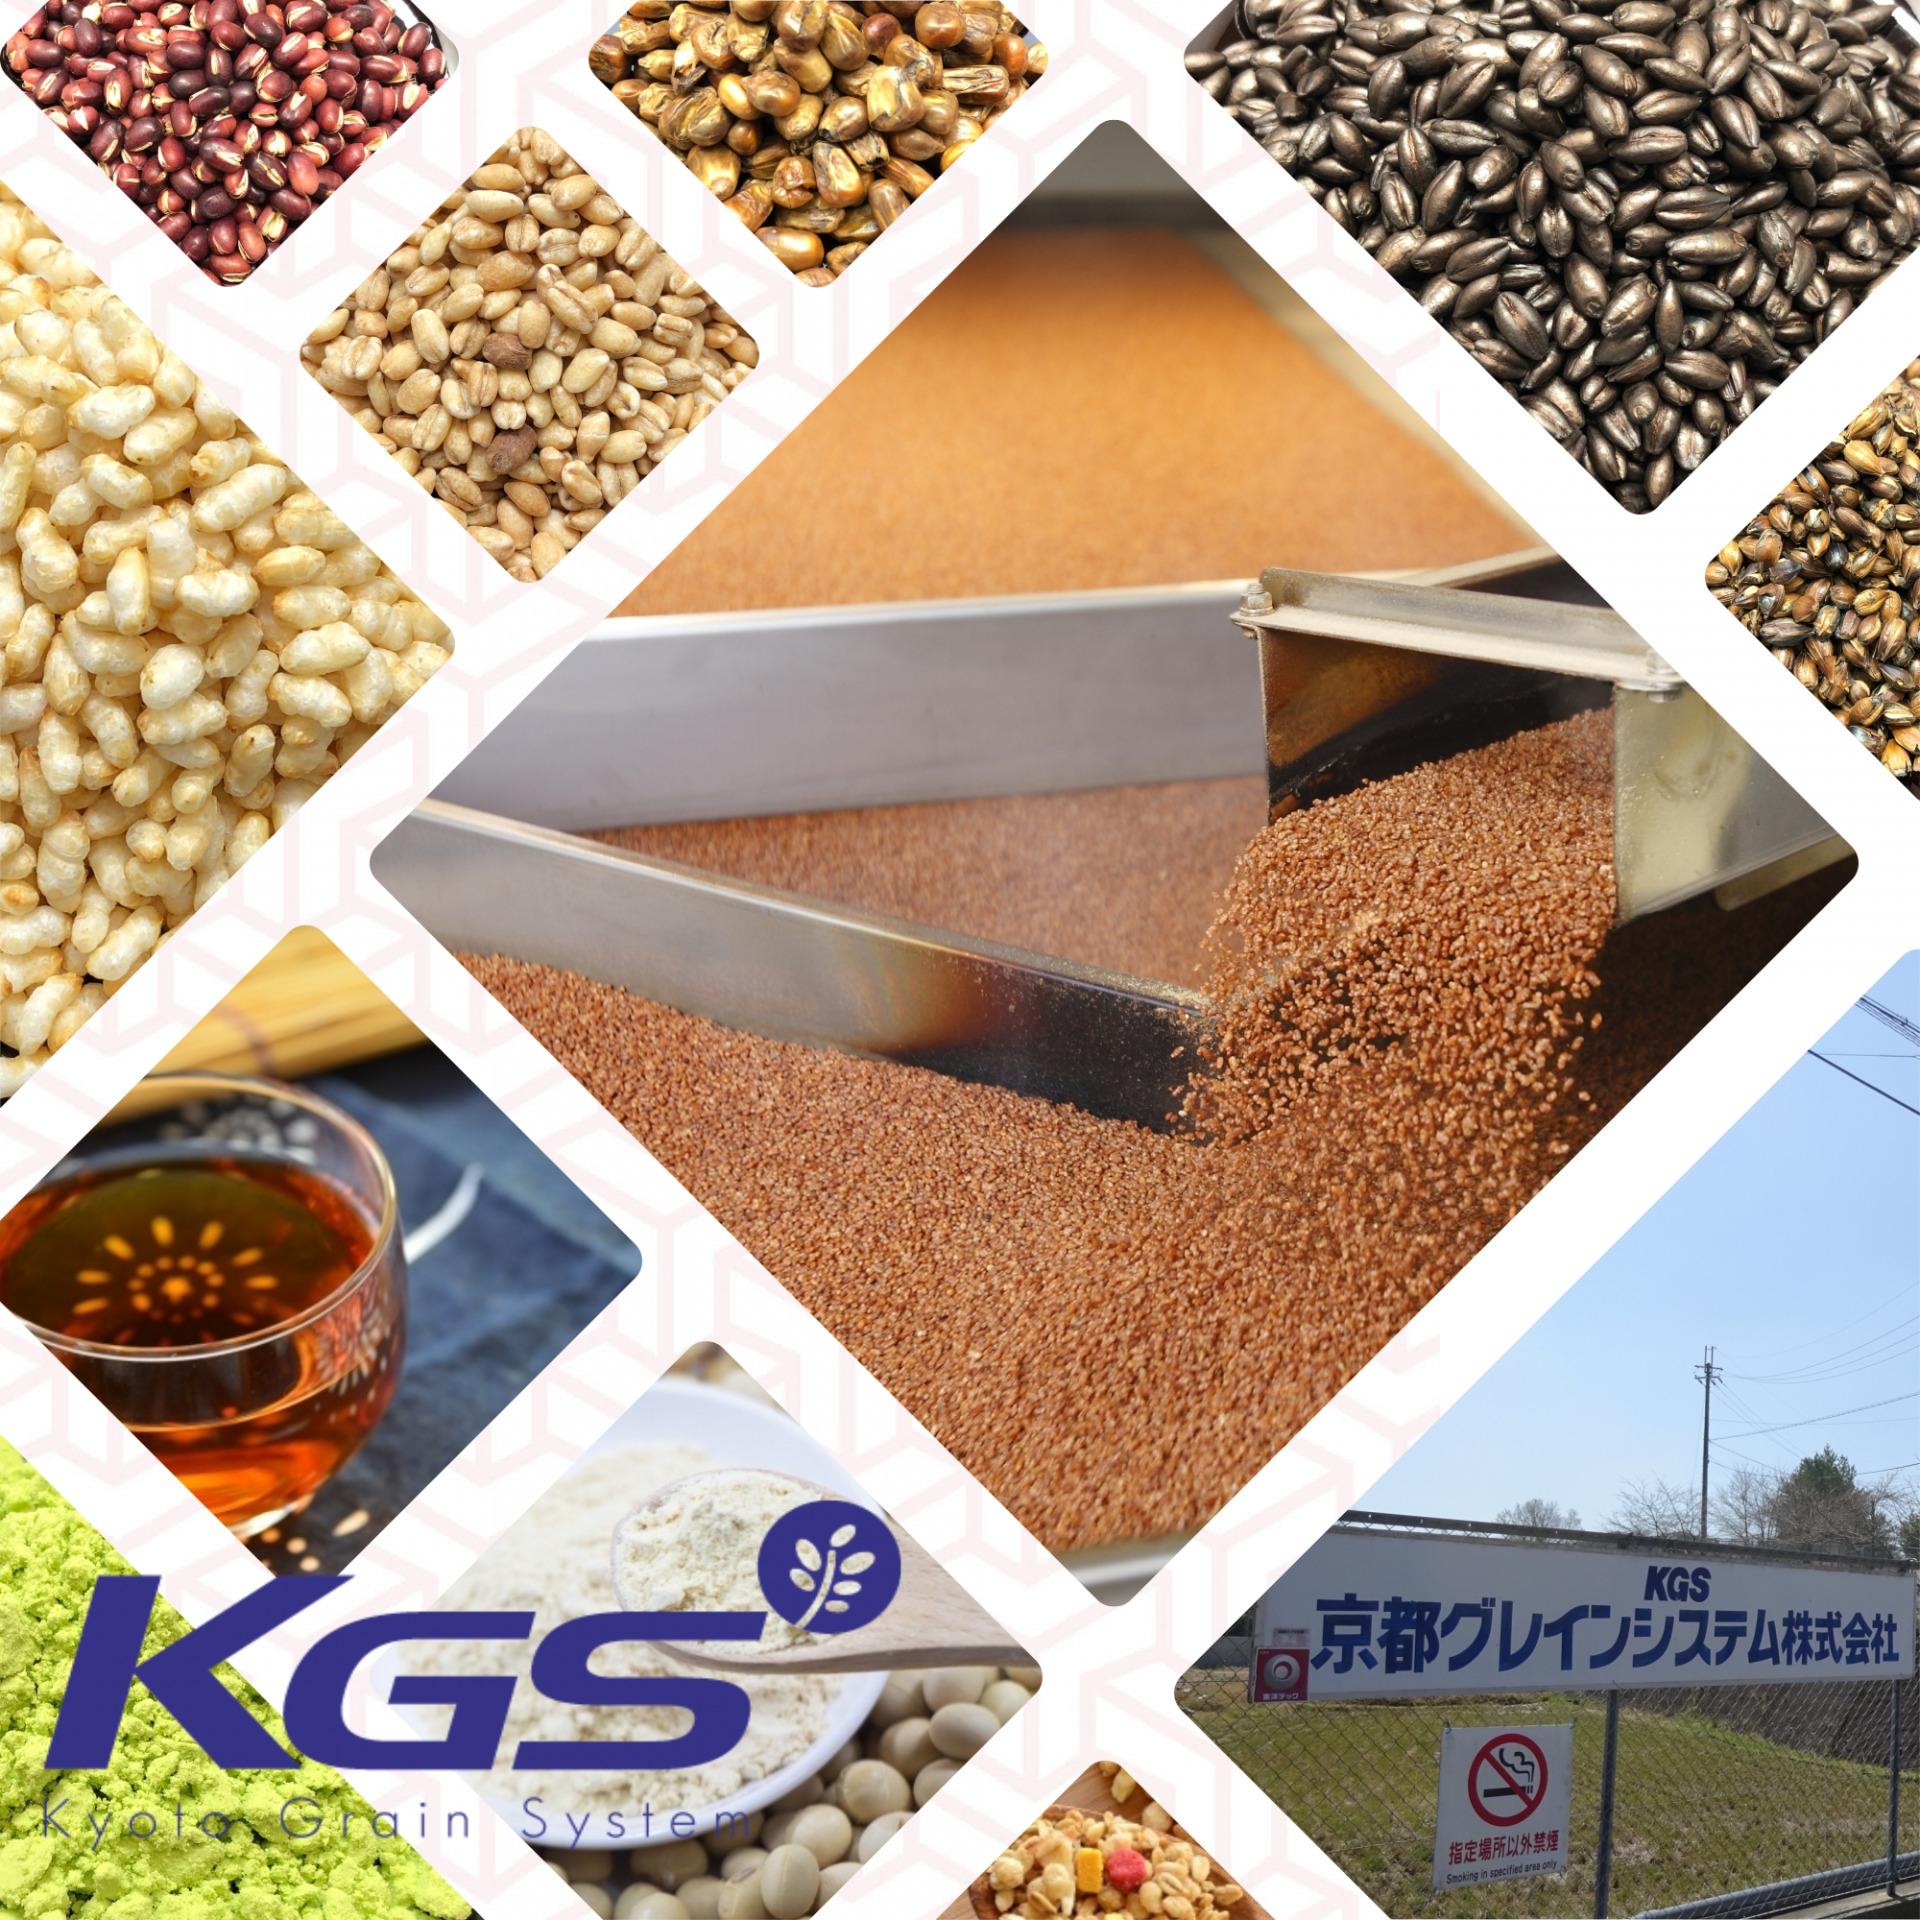 KGS加工ラインのご紹介のアイキャッチ画像